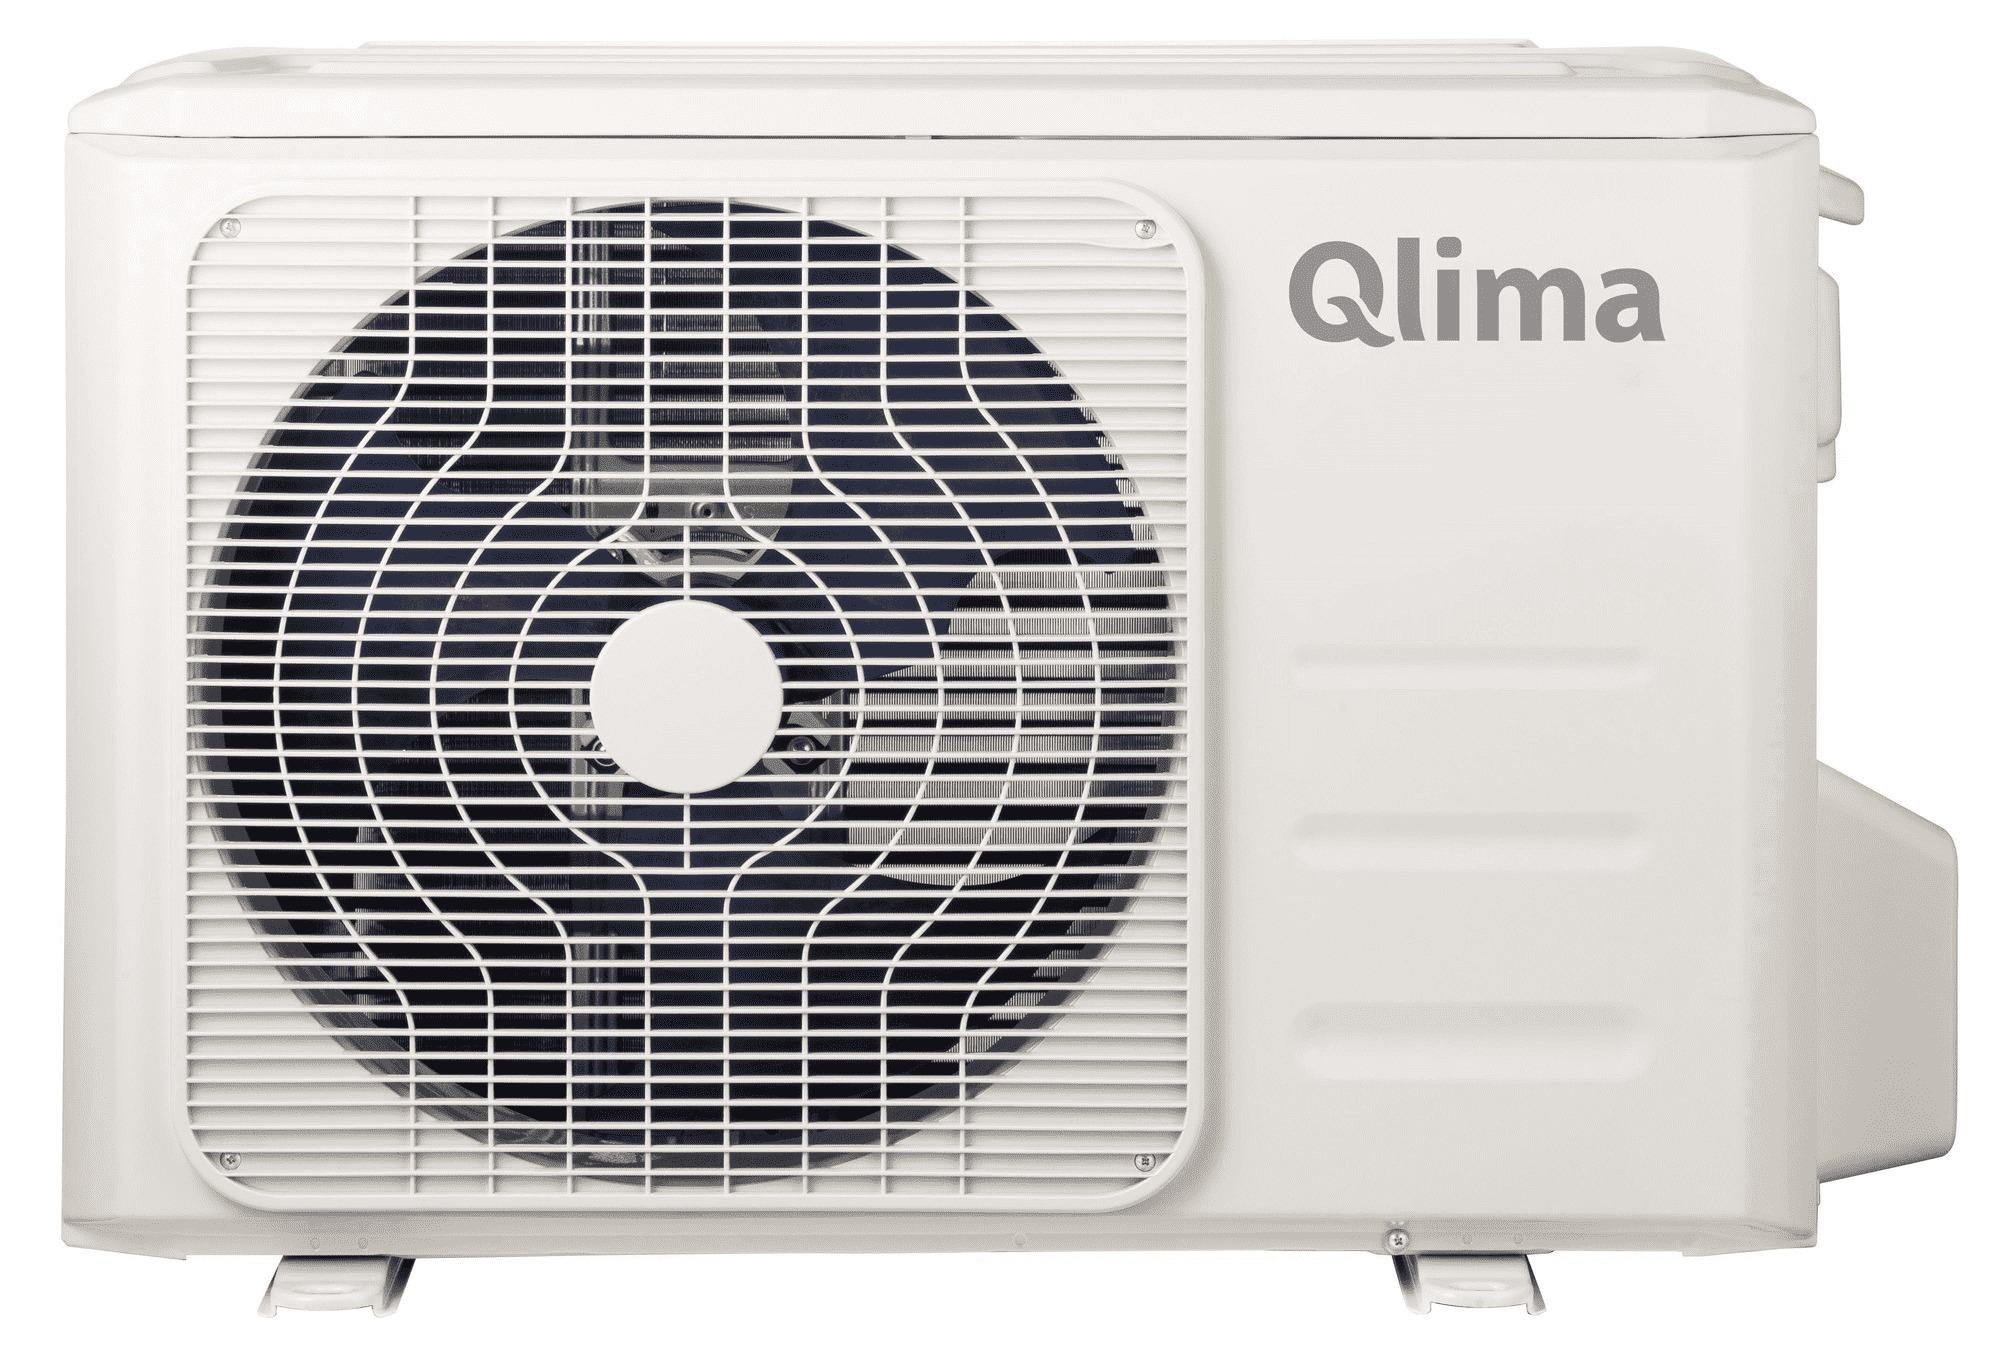 Qlima split unit airco SC 5232 compleet